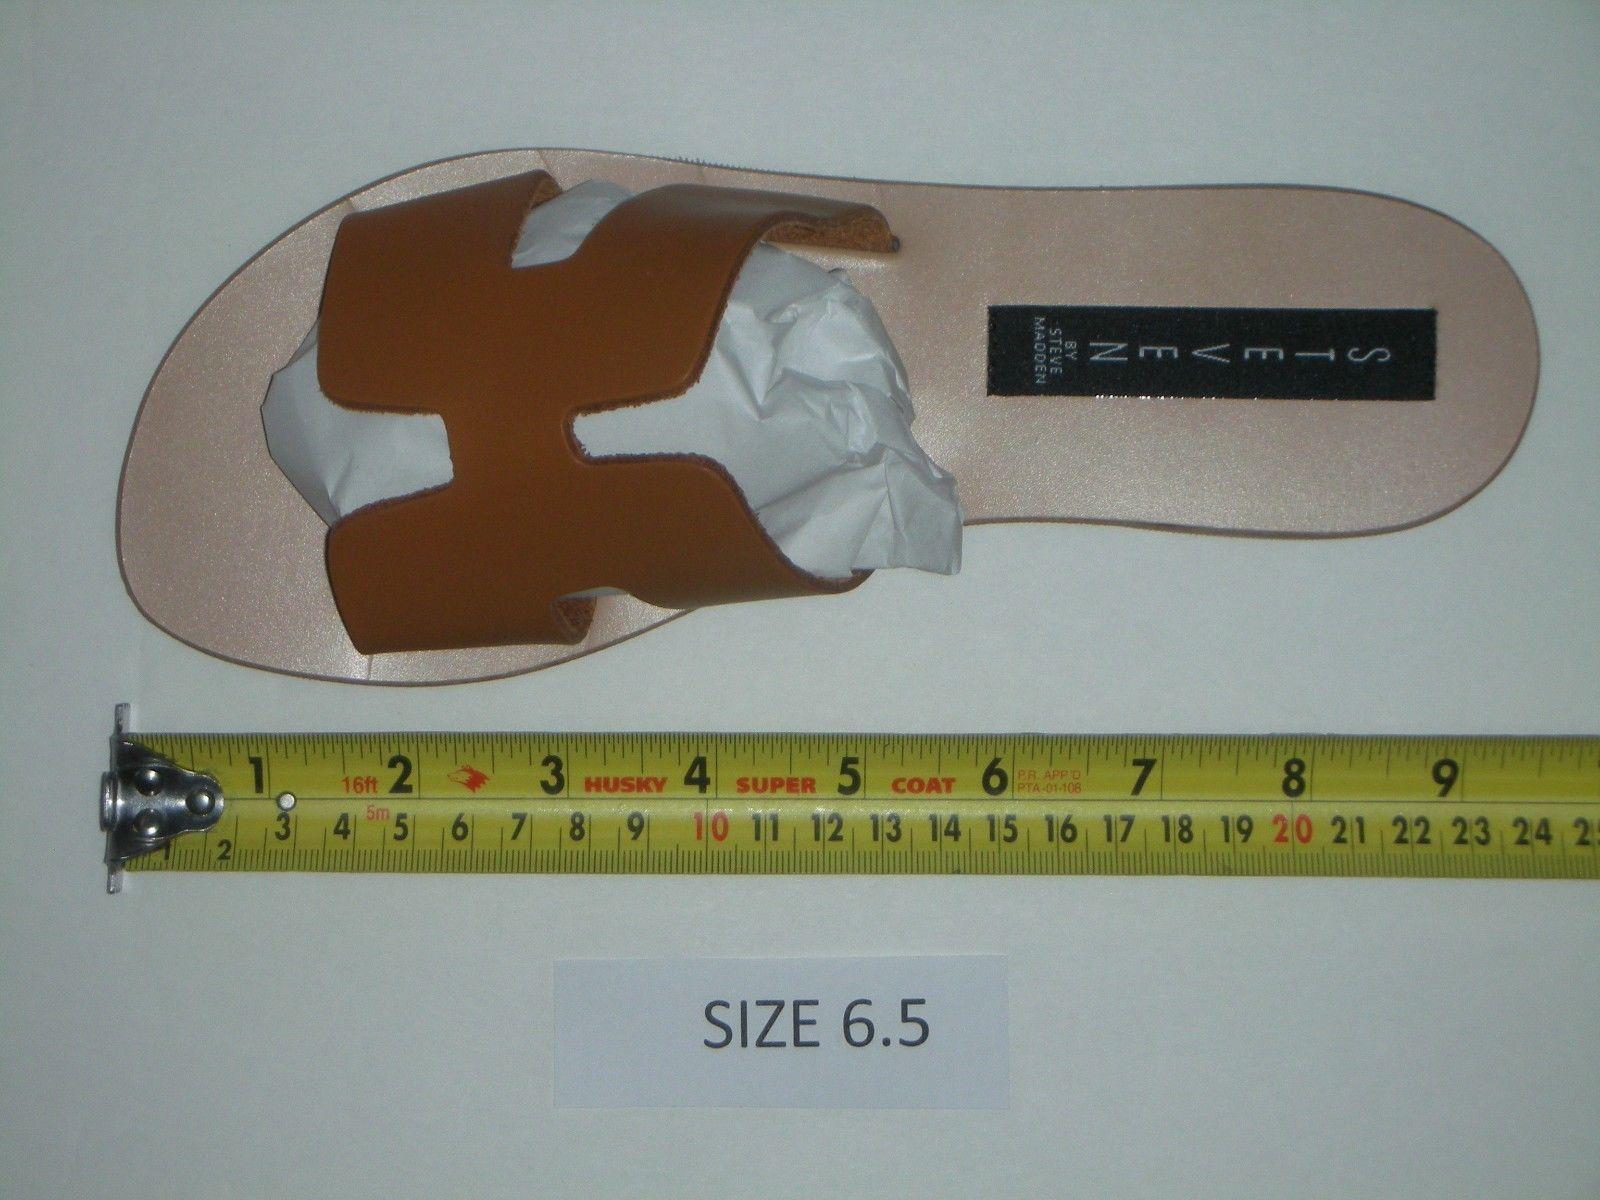 Steven by Steve Madden Greece Flat Sandals Slides Cognac Leather Size 6.5